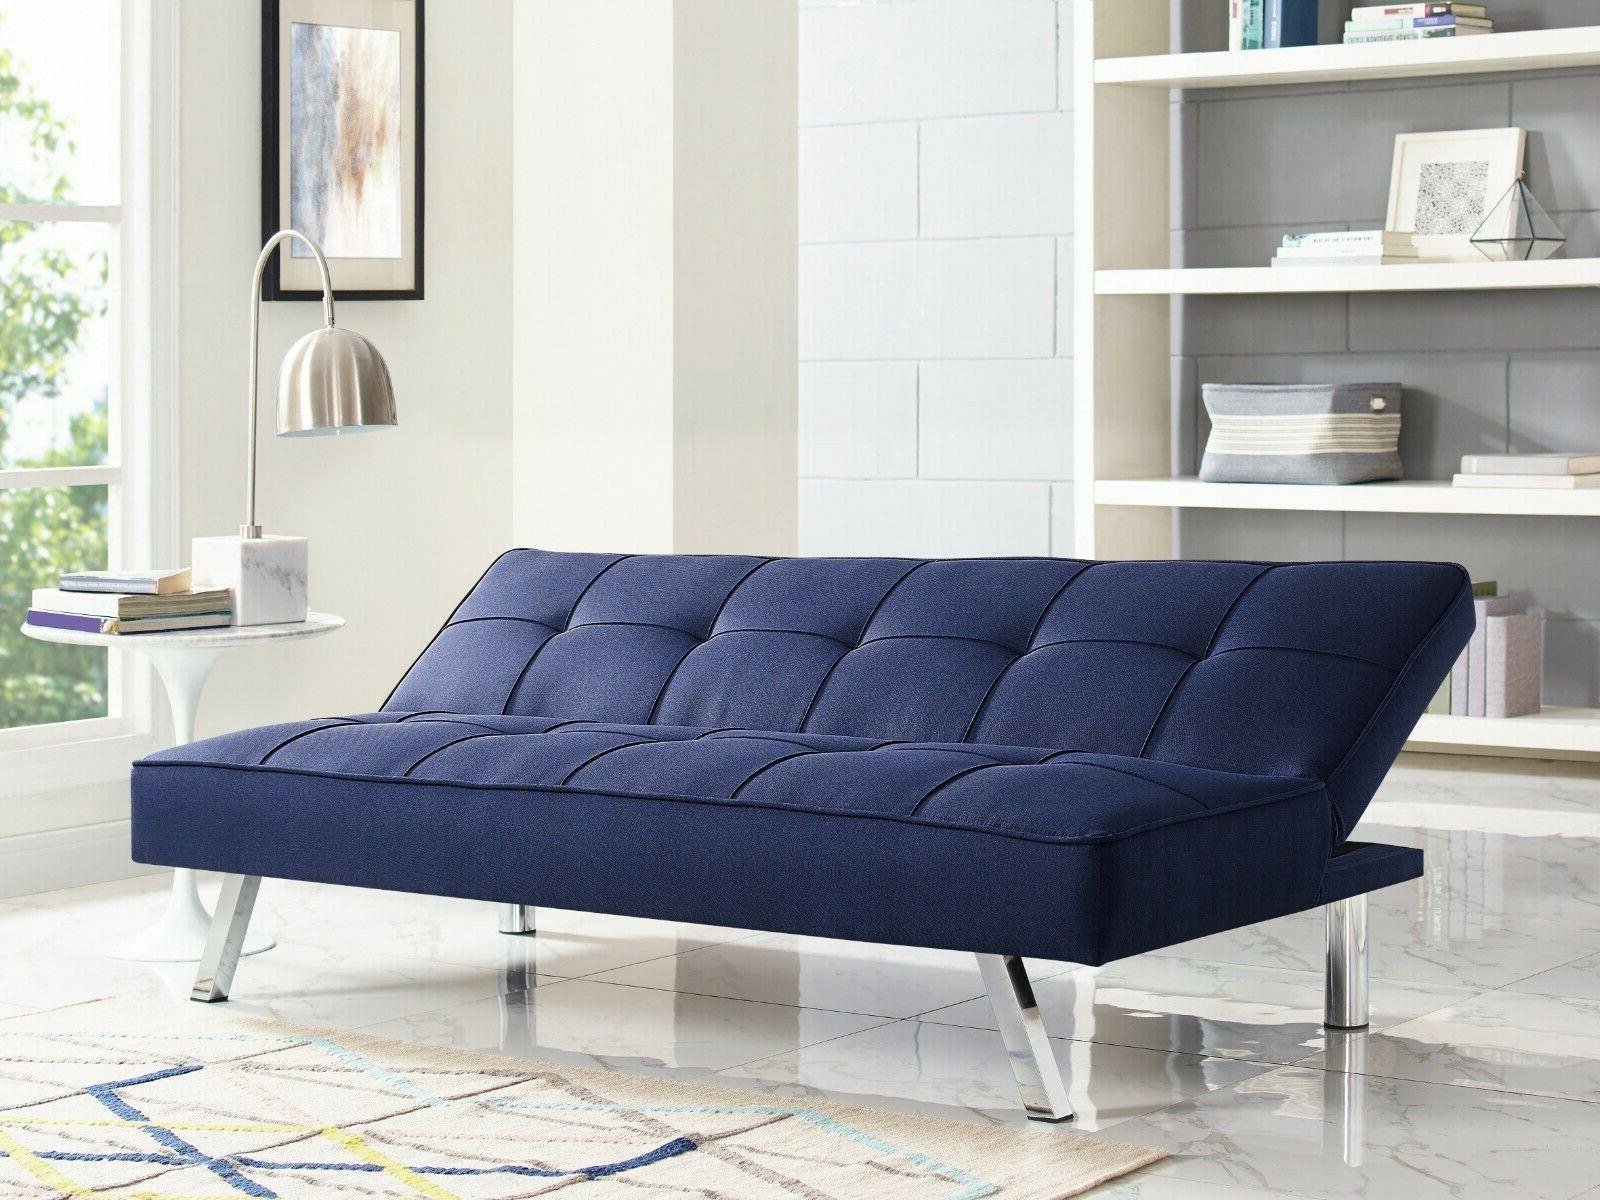 Serta Upholstery Sofa, Navy Blue